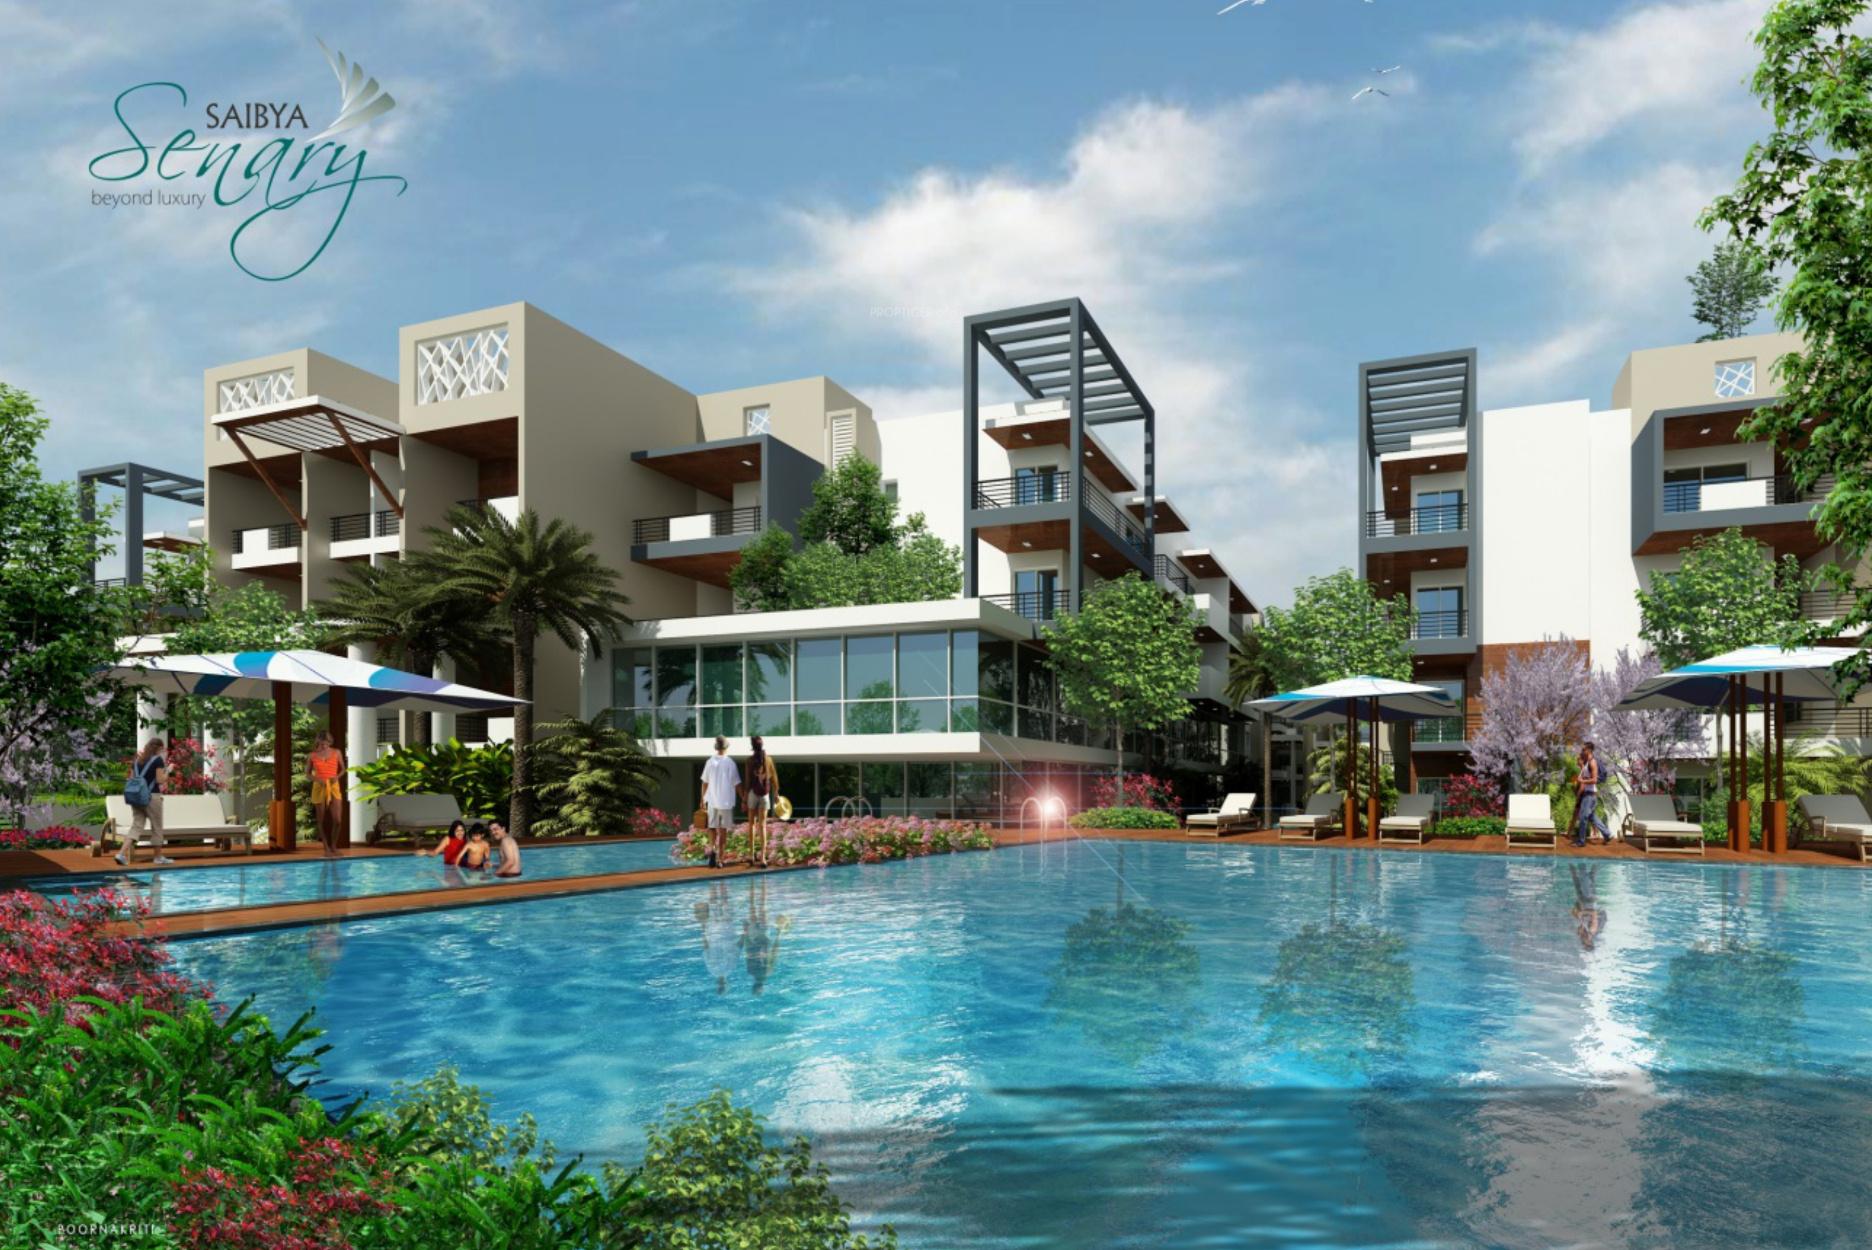 Saibya Senary In Harlur Bangalore Price Location Map Floor Plan Amp Reviews Proptiger Com